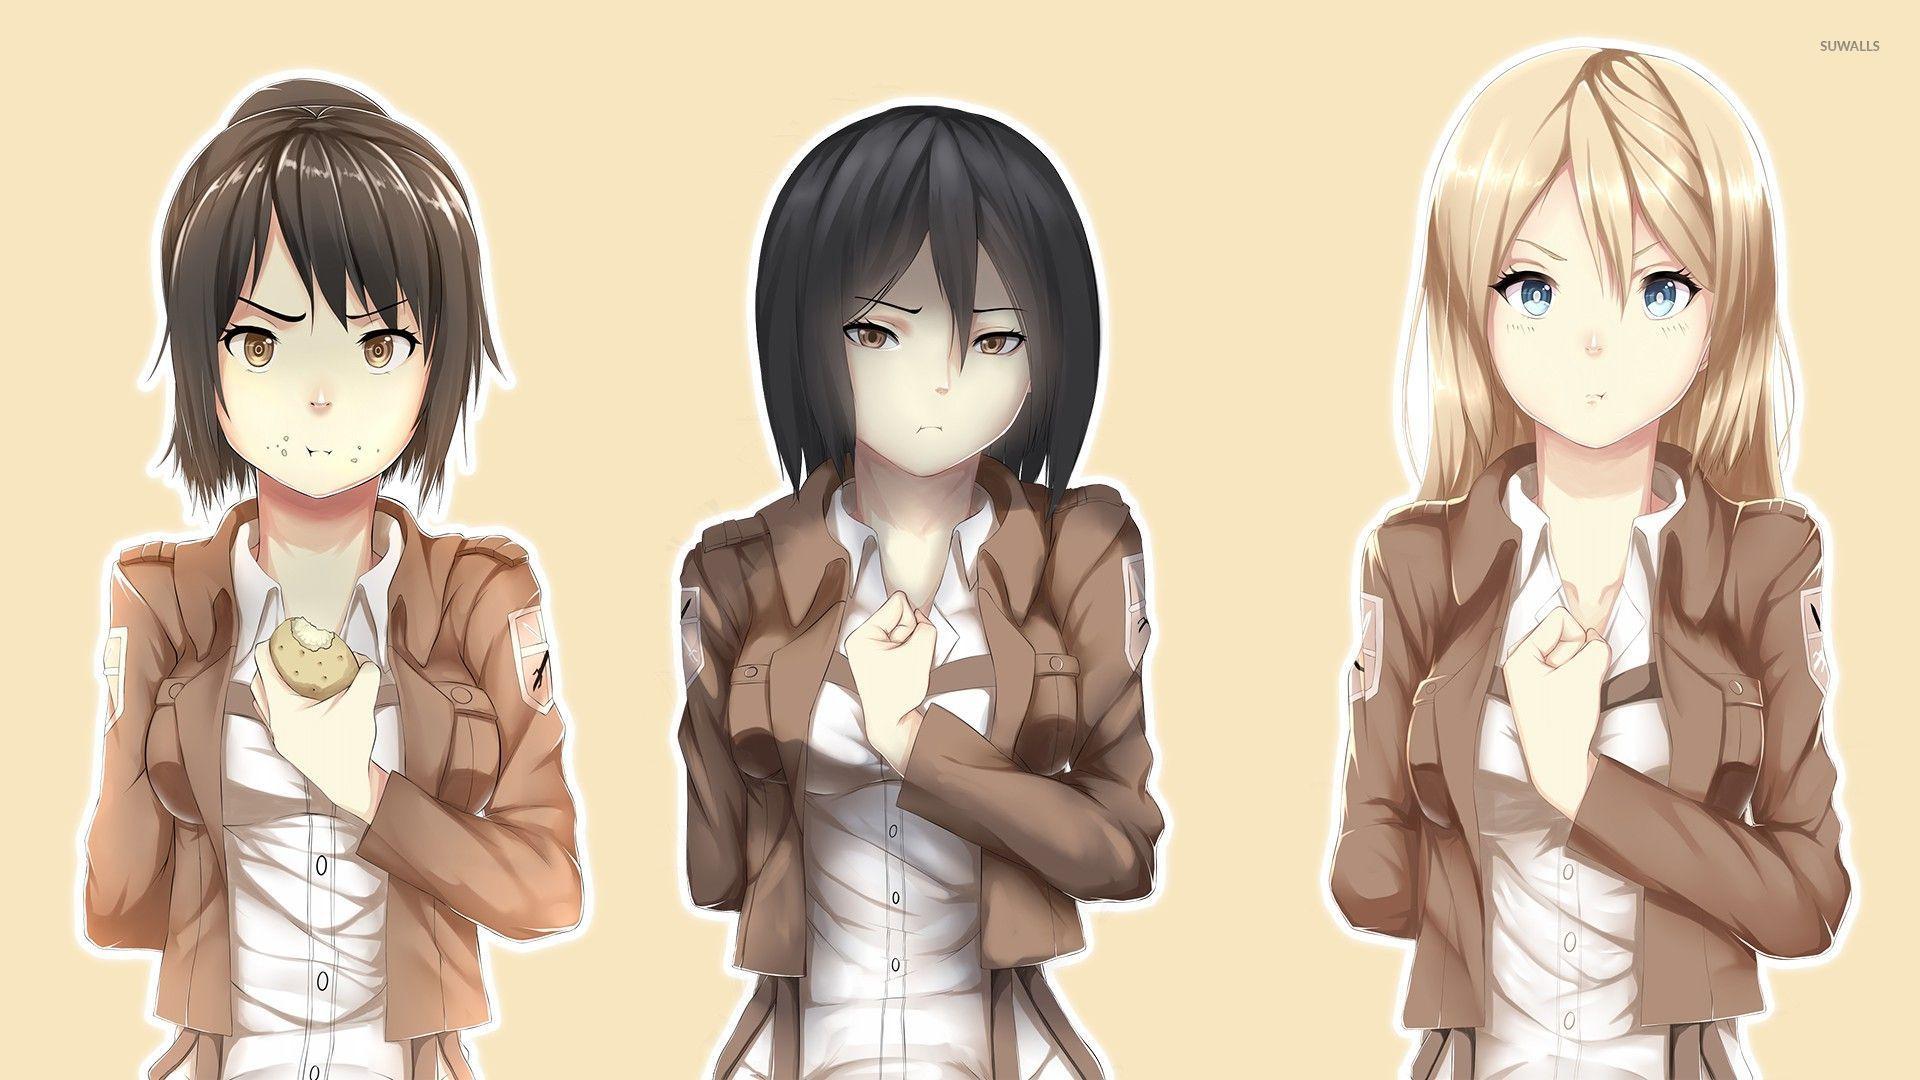 Shingeki No Kyojin Female Characters Wallpaper Shingeki No Kyojin Original Character 473866 Hd Wallpaper Backgrounds Download